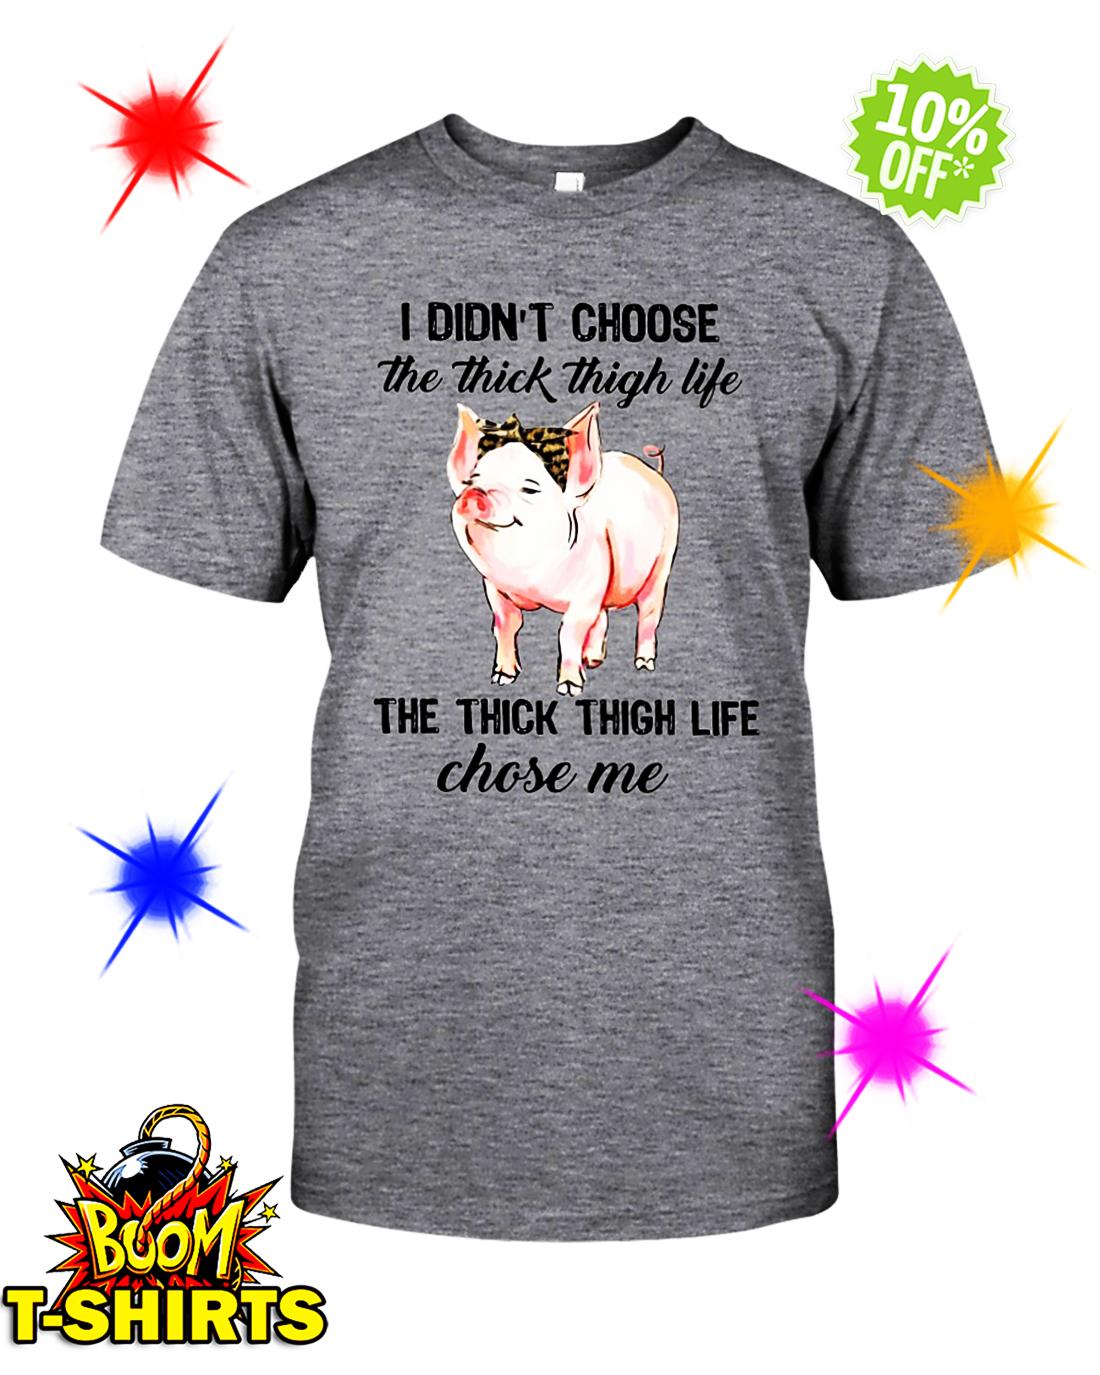 Pig I Didn't Choose The Thick Thigh Life The Thick Thigh Life Chose Me shirt